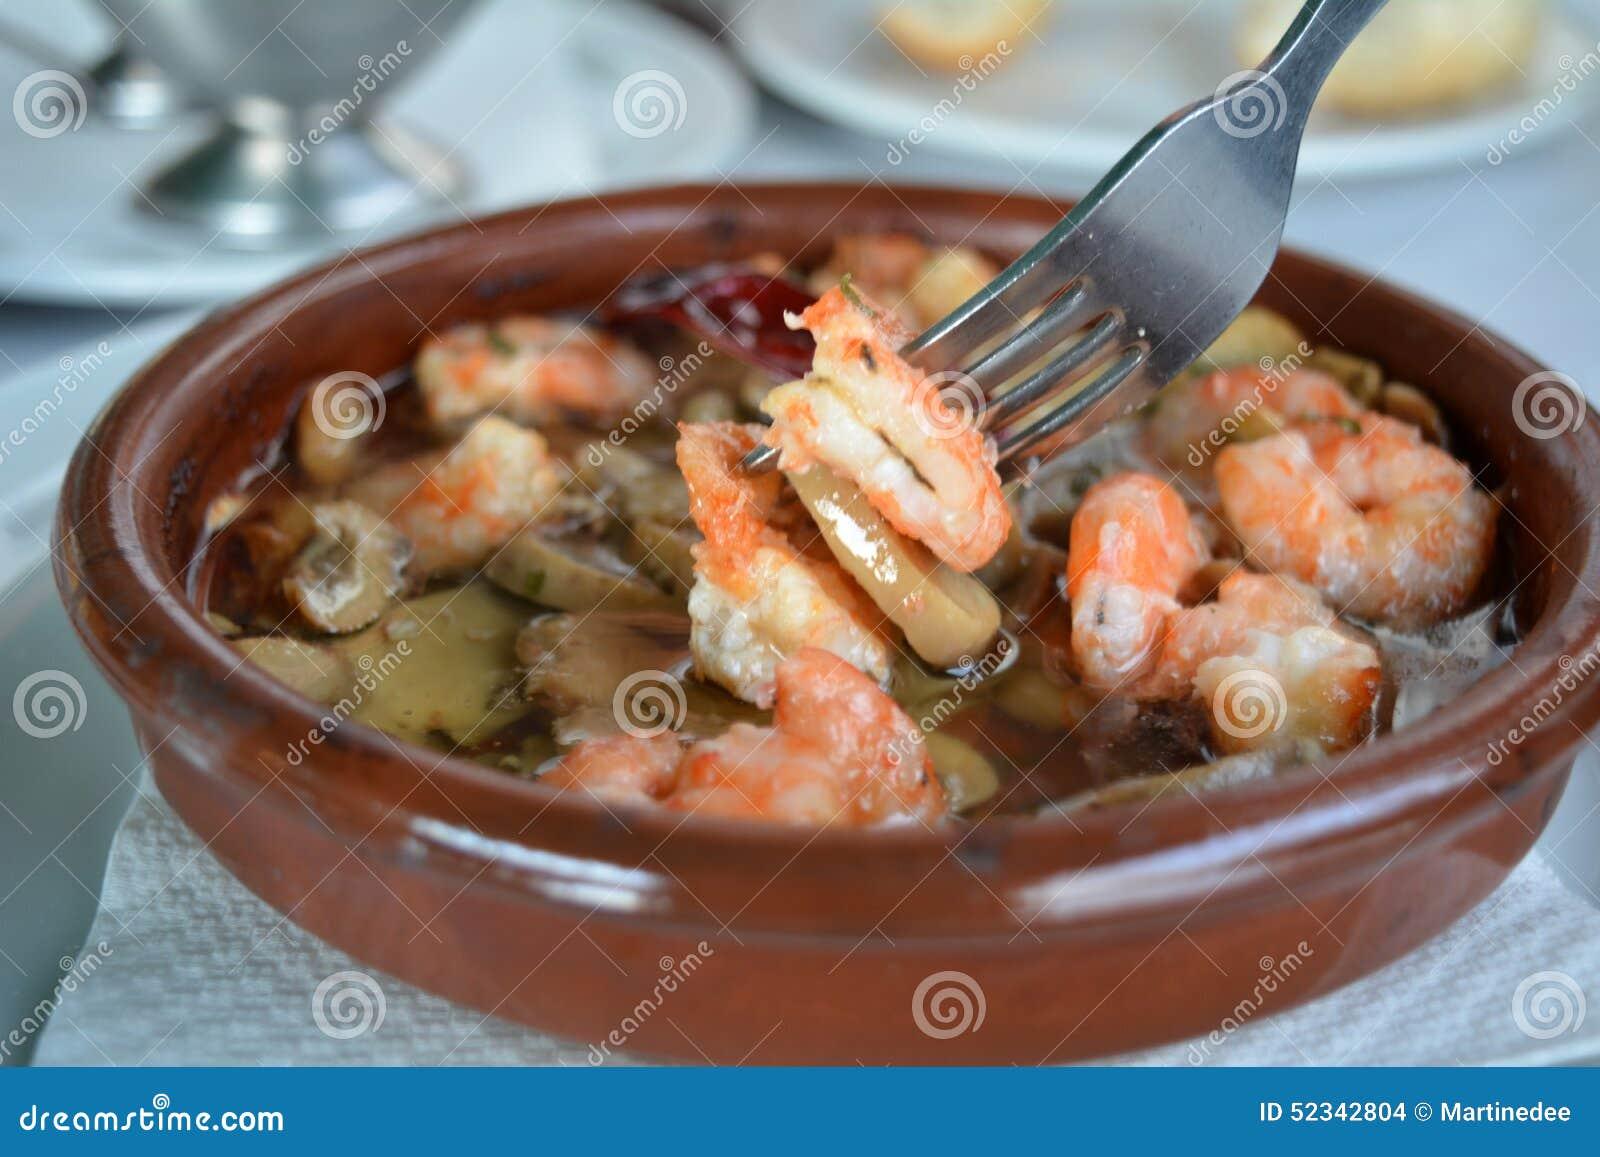 how to cook sizzling garlic prawns